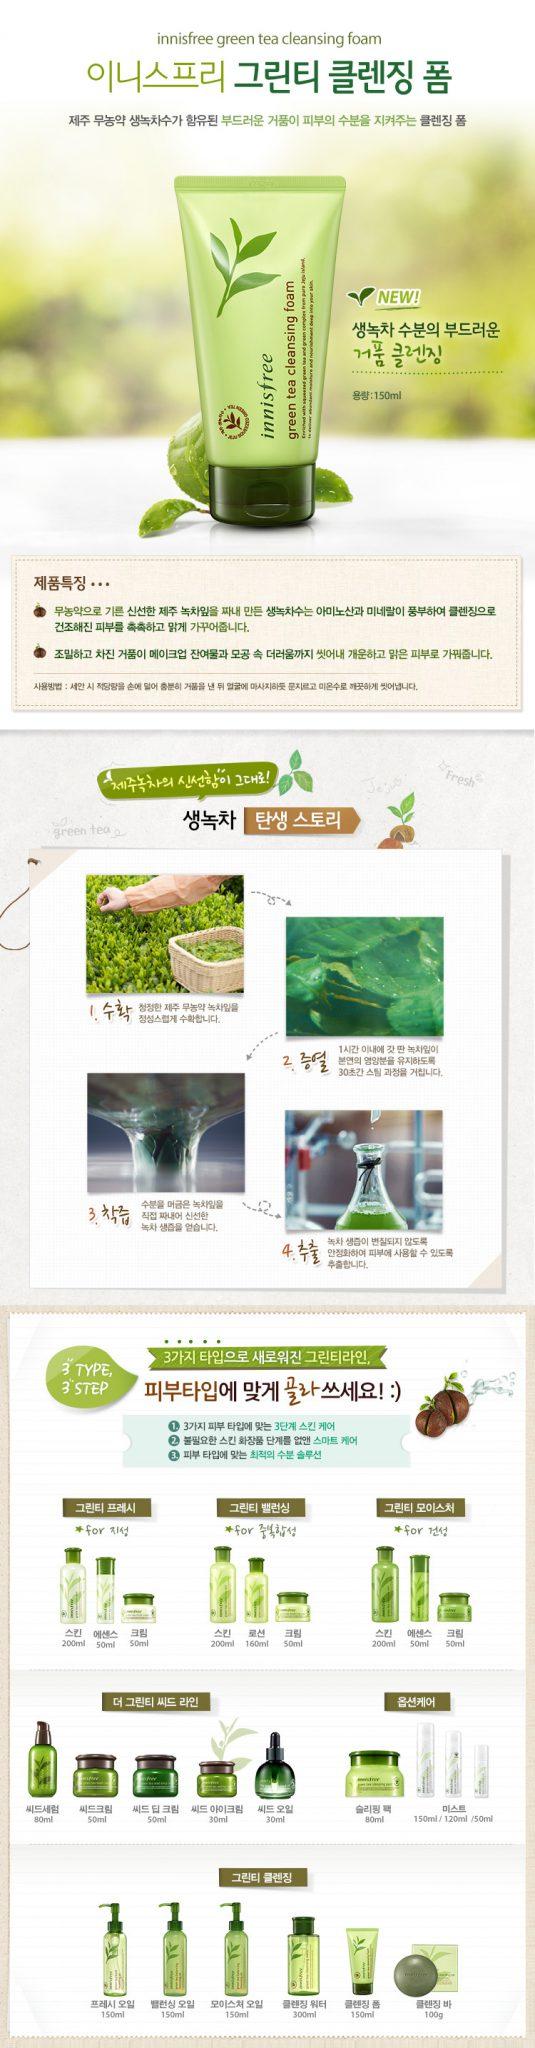 InnissfreeGreen tea pure cleansing foam